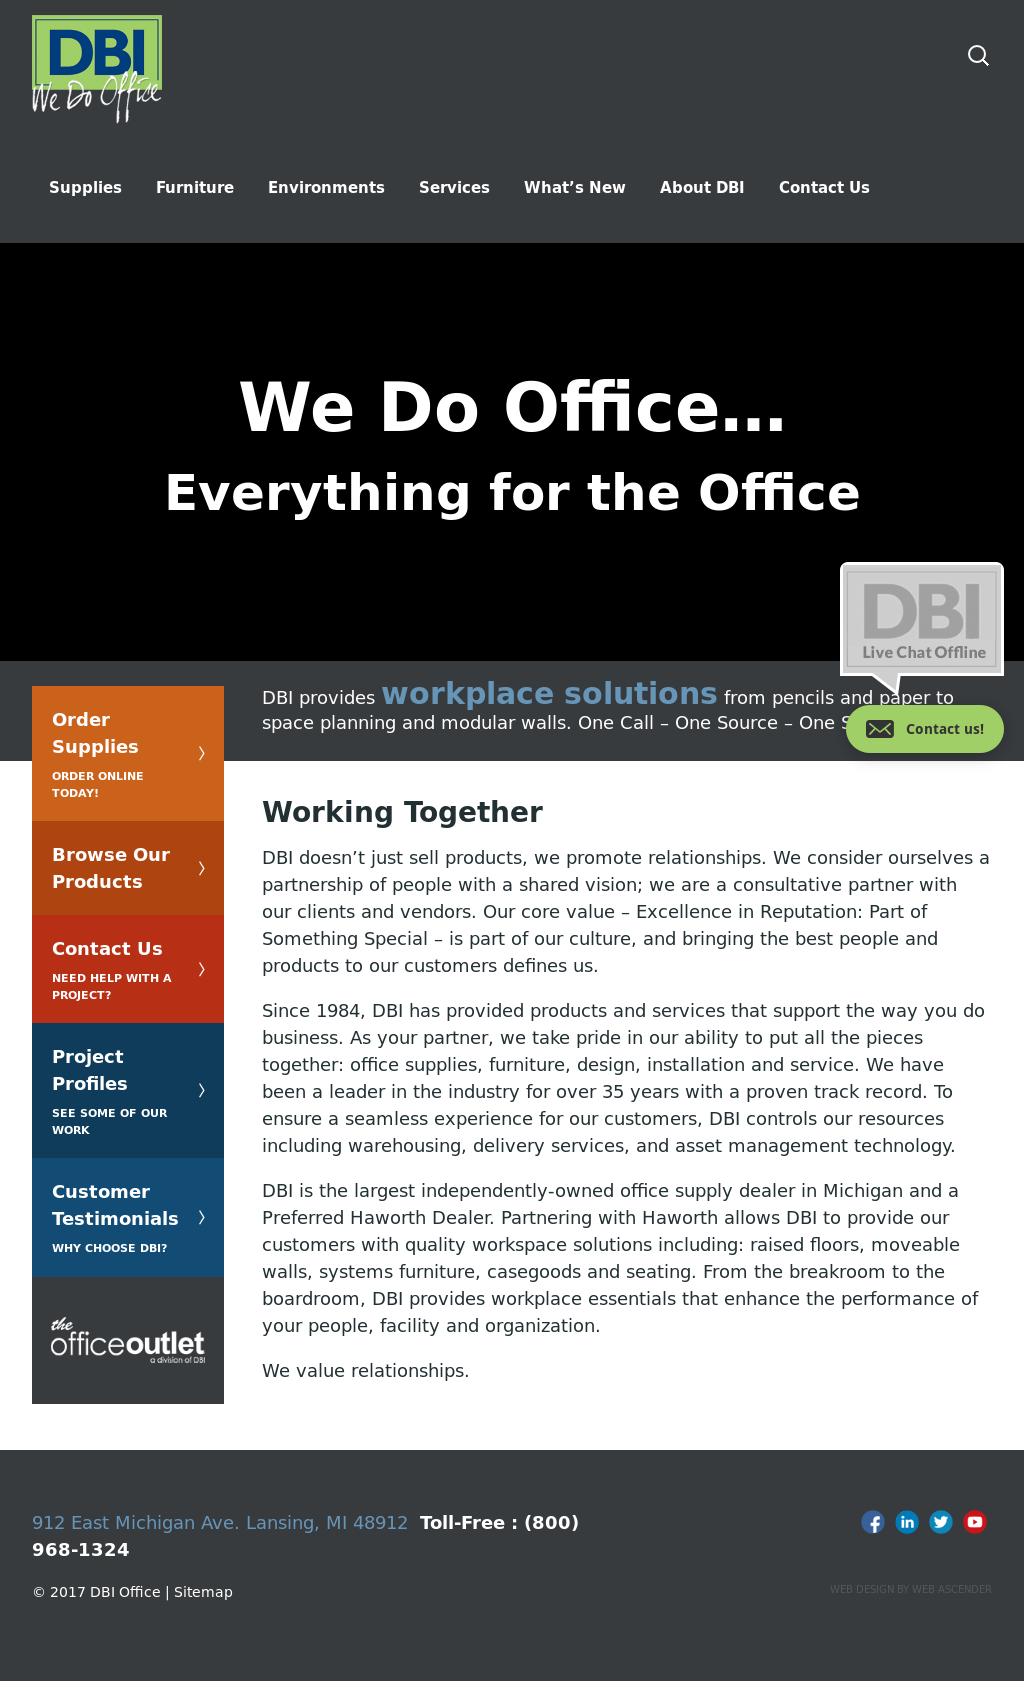 Dbi We Do Office Website History